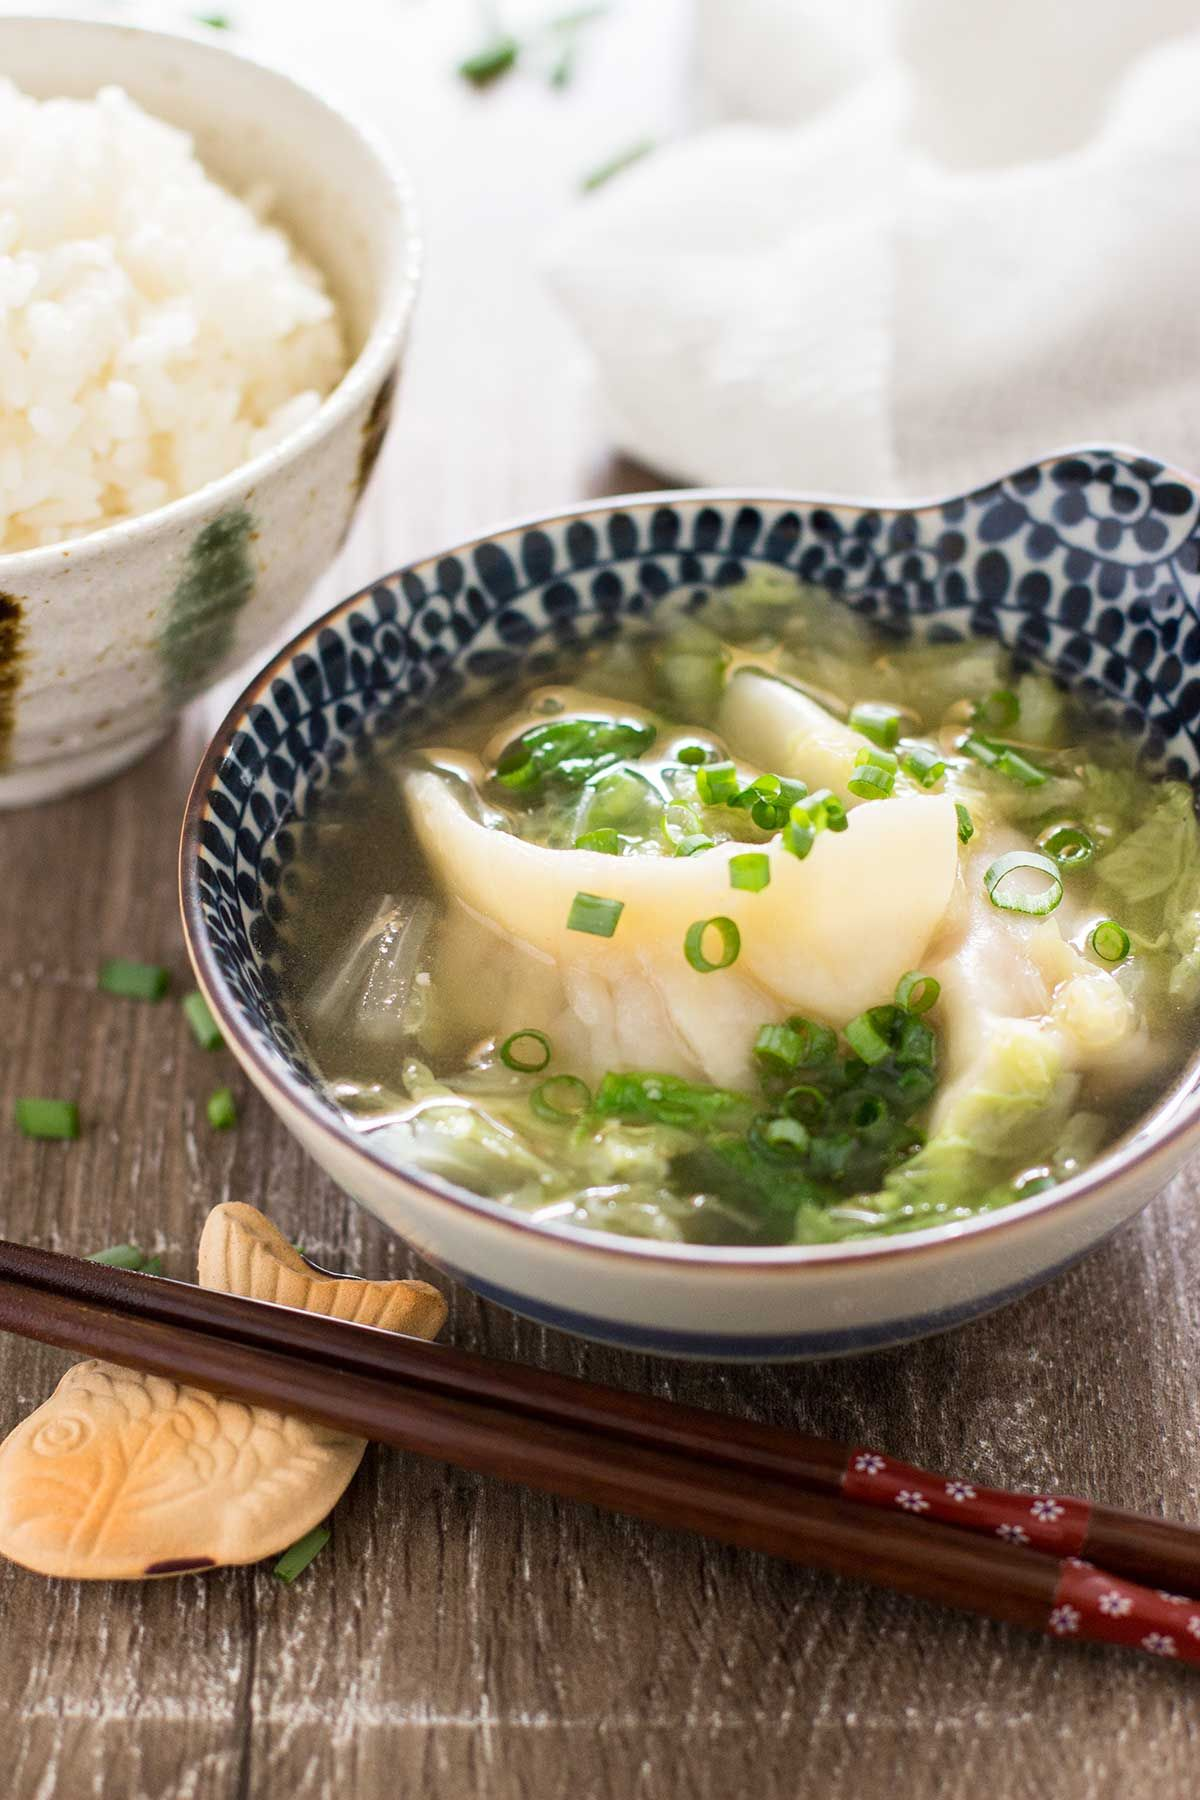 gyoza soup 餃子スープ chopstick chronicles recipe recipes asian dishes asian recipes pinterest